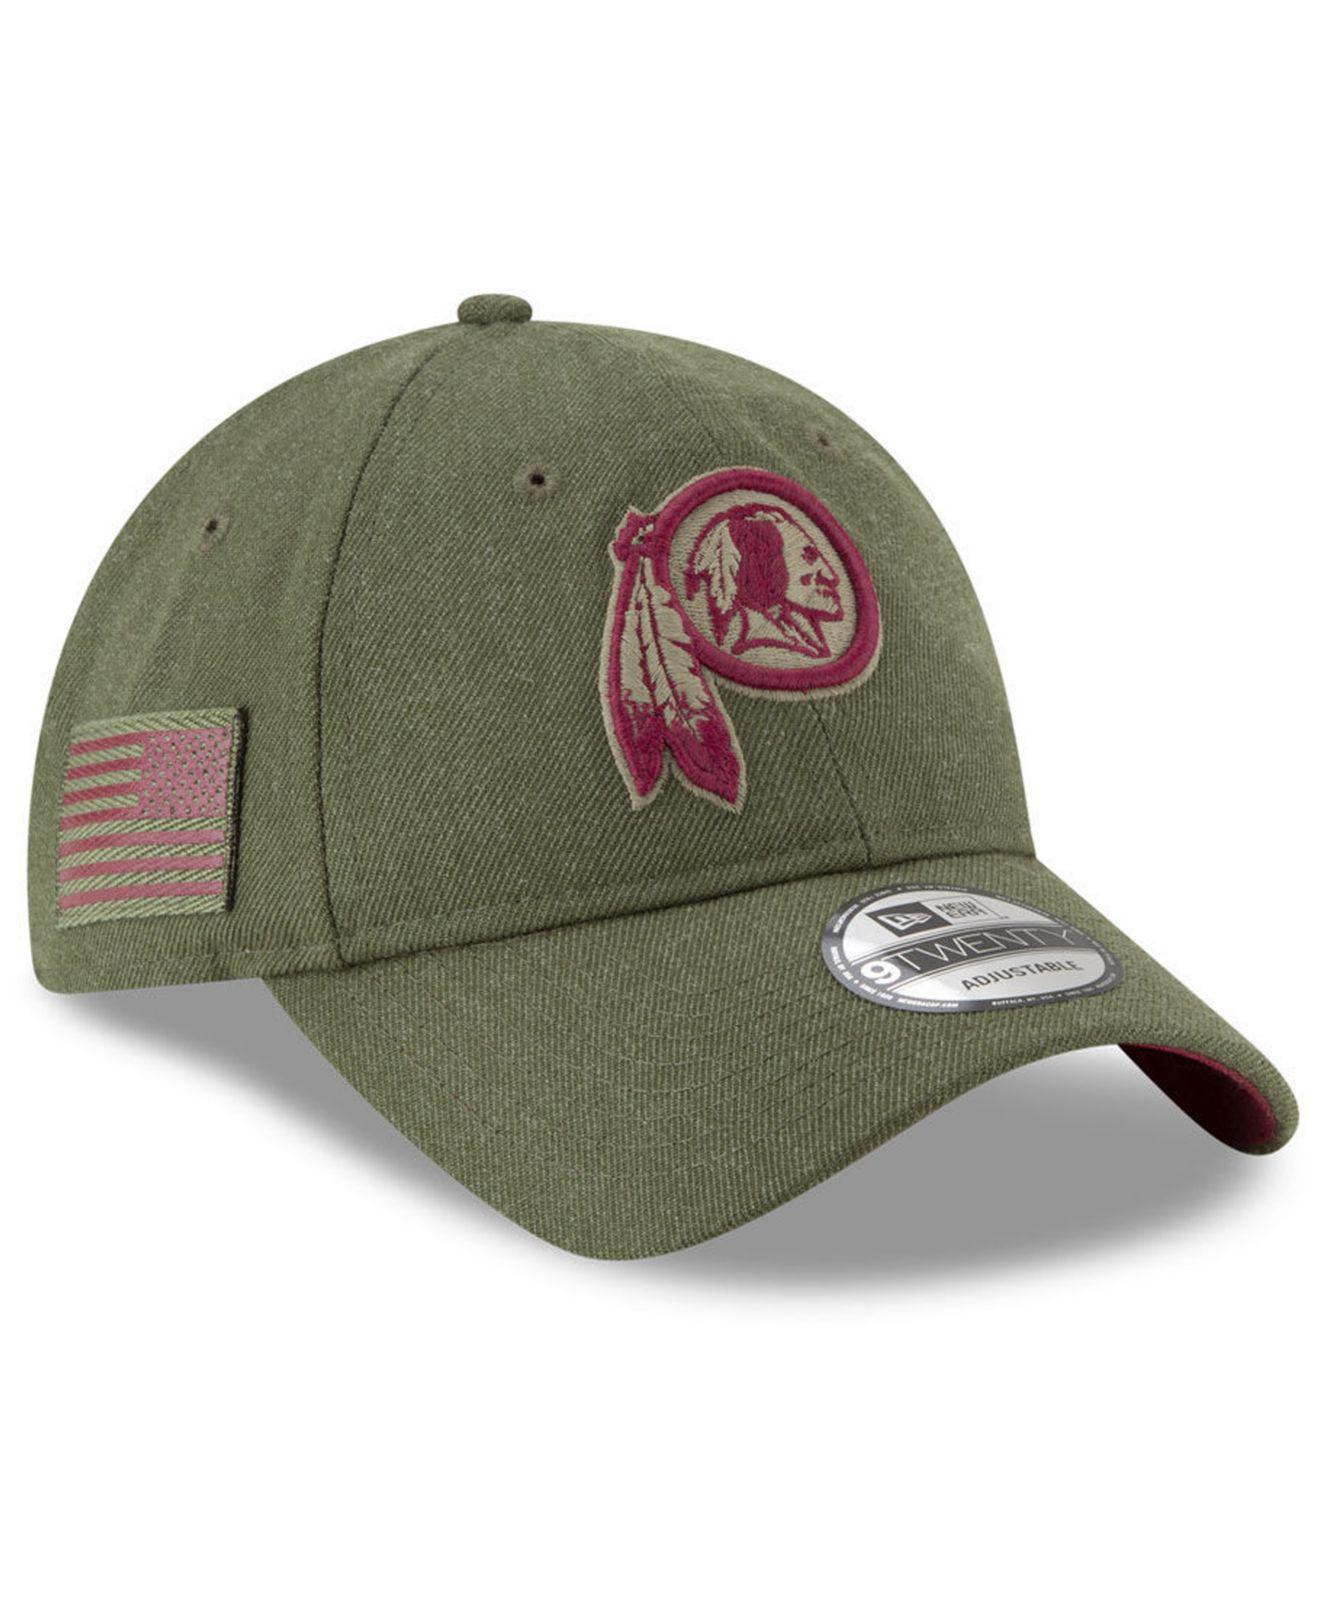 b042ee53b Lyst - Ktz Washington Redskins Salute To Service 9twenty Cap in ...